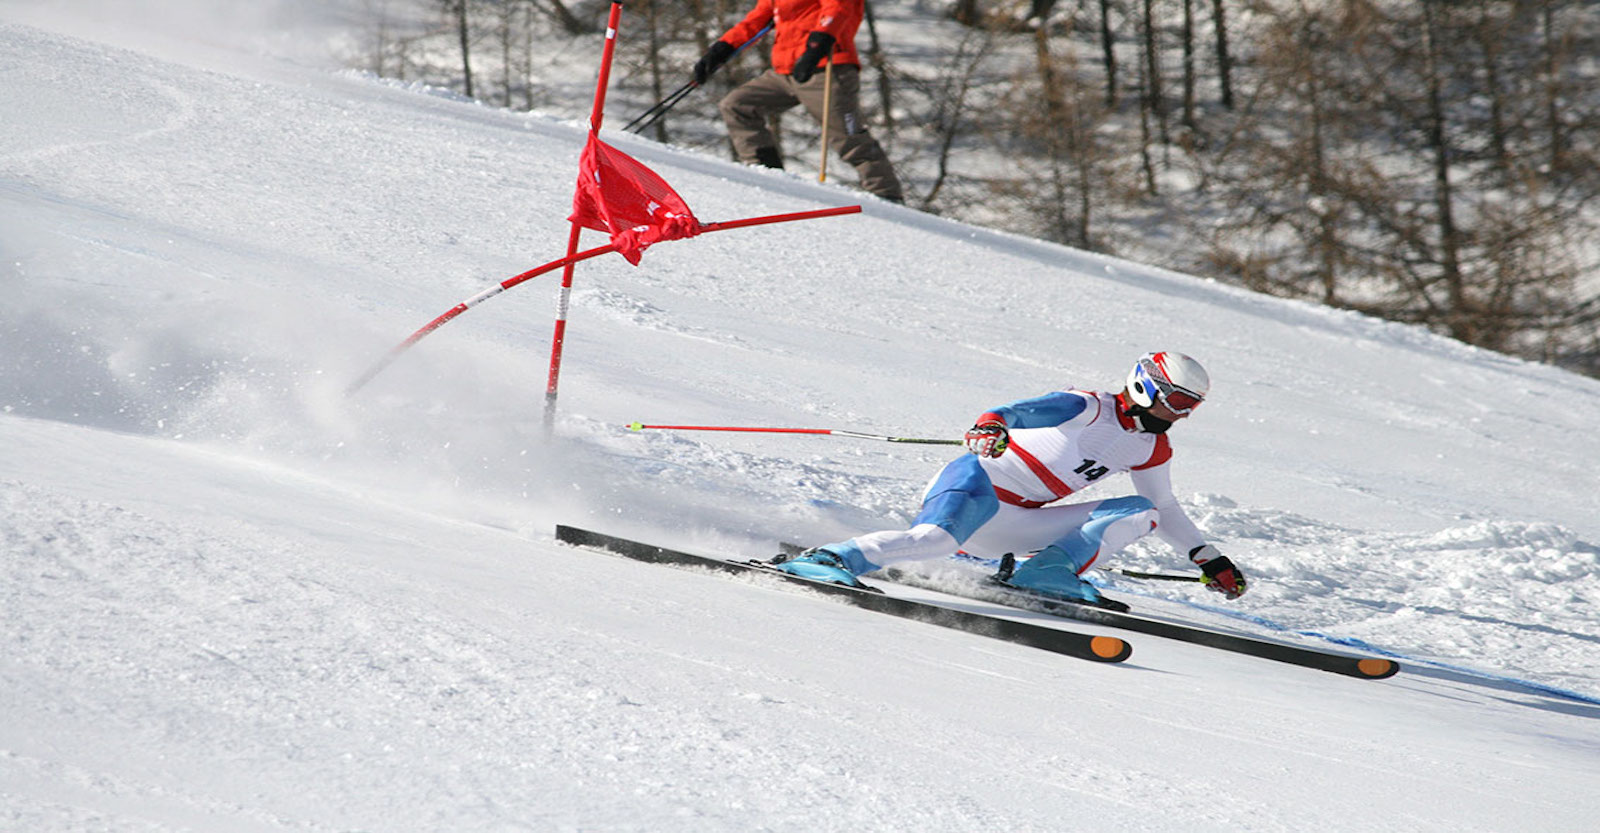 Downhill skier going through the gates